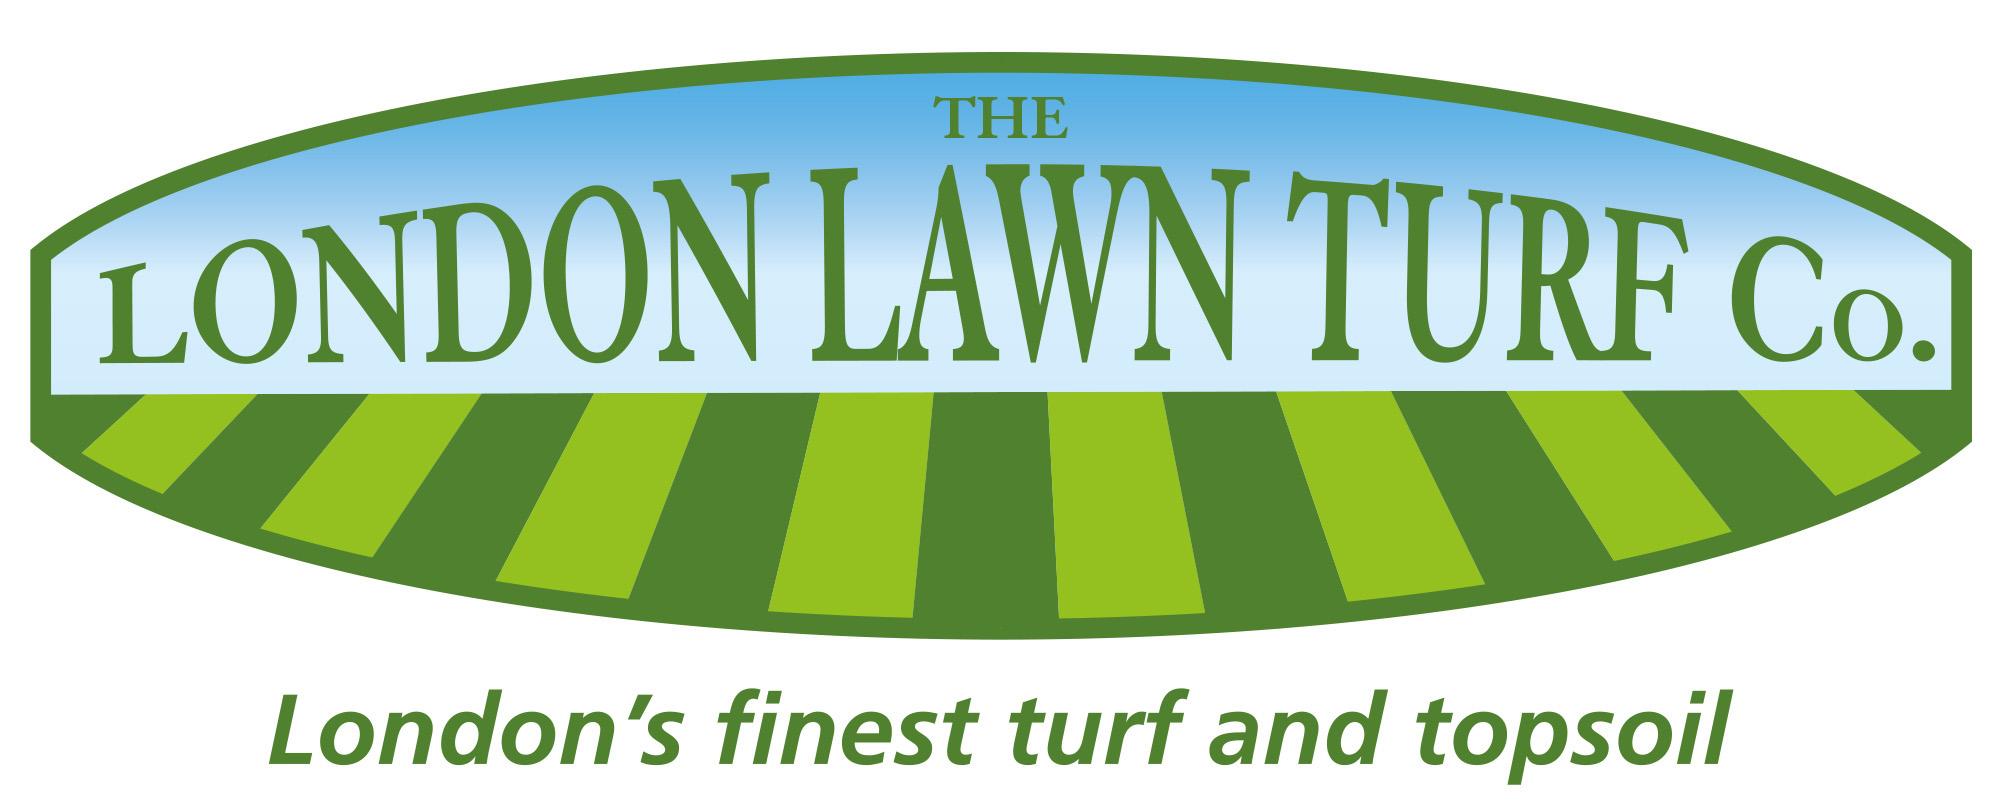 Read London Lawn Turf Company Reviews